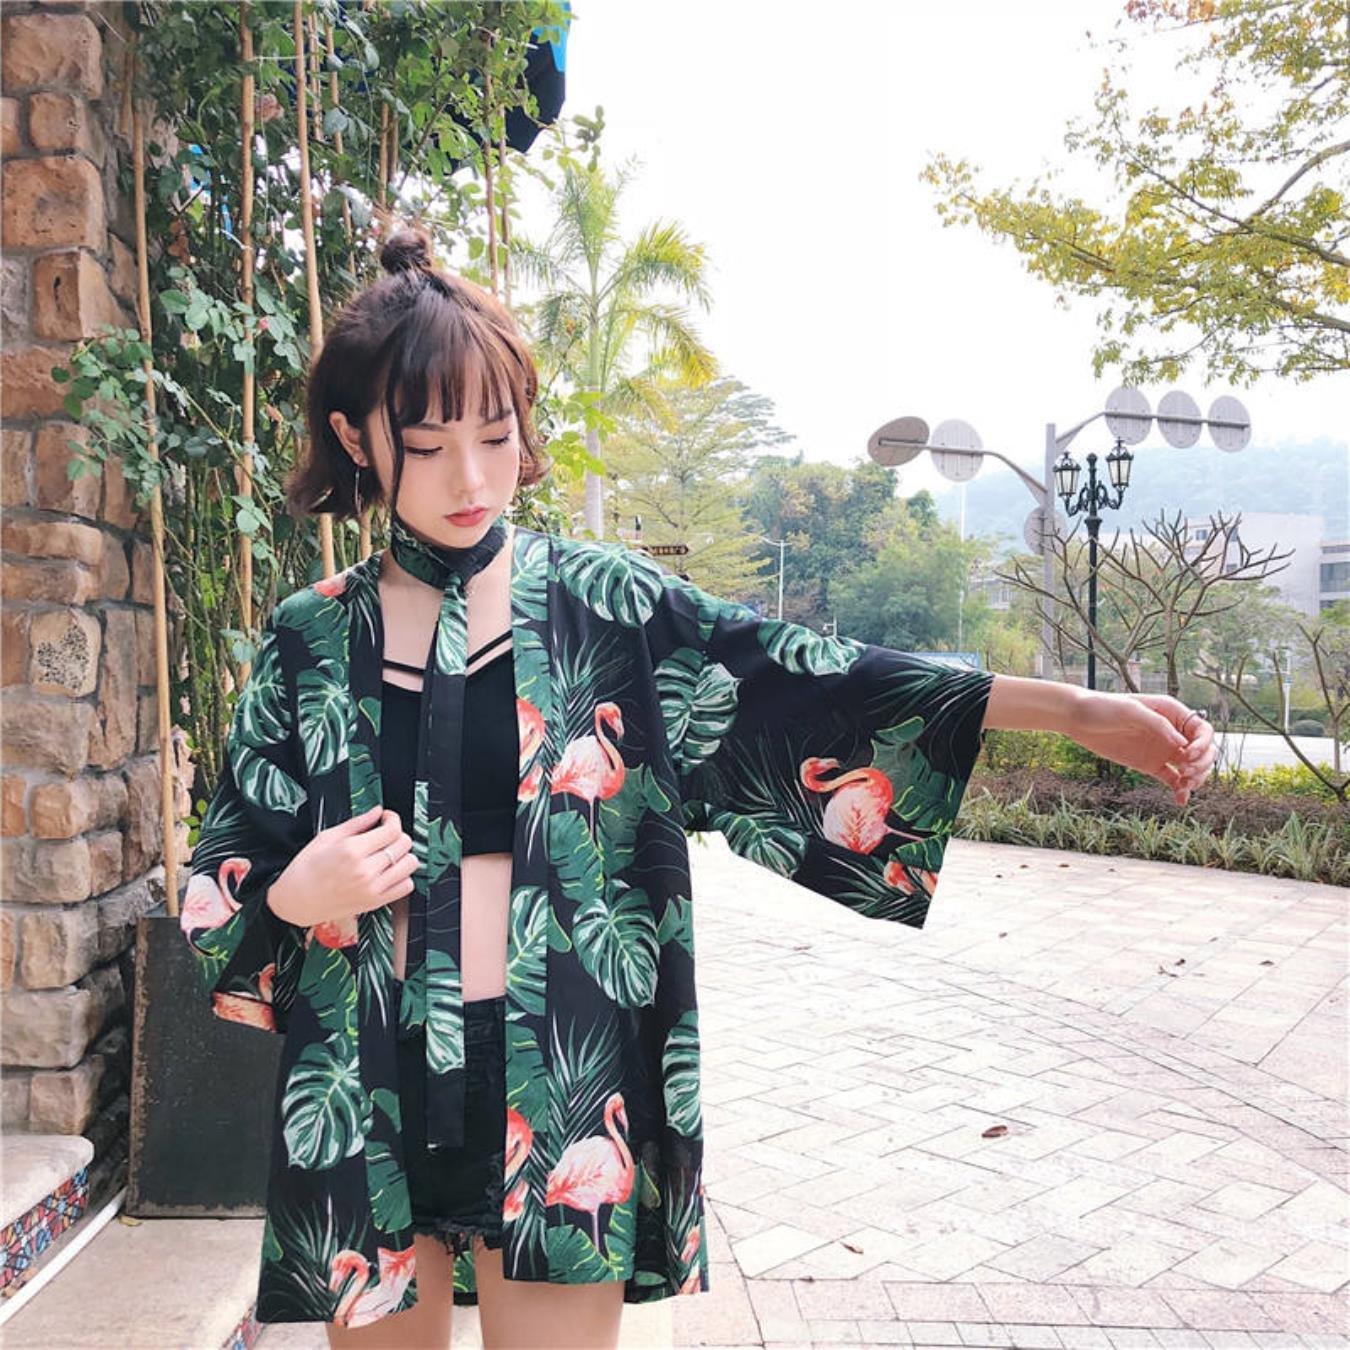 Neploe Harajuku Kimono Blouses Japanese Long Cardigan 3D Flower Print Outerwear Shirts Women Sun-protection Coats